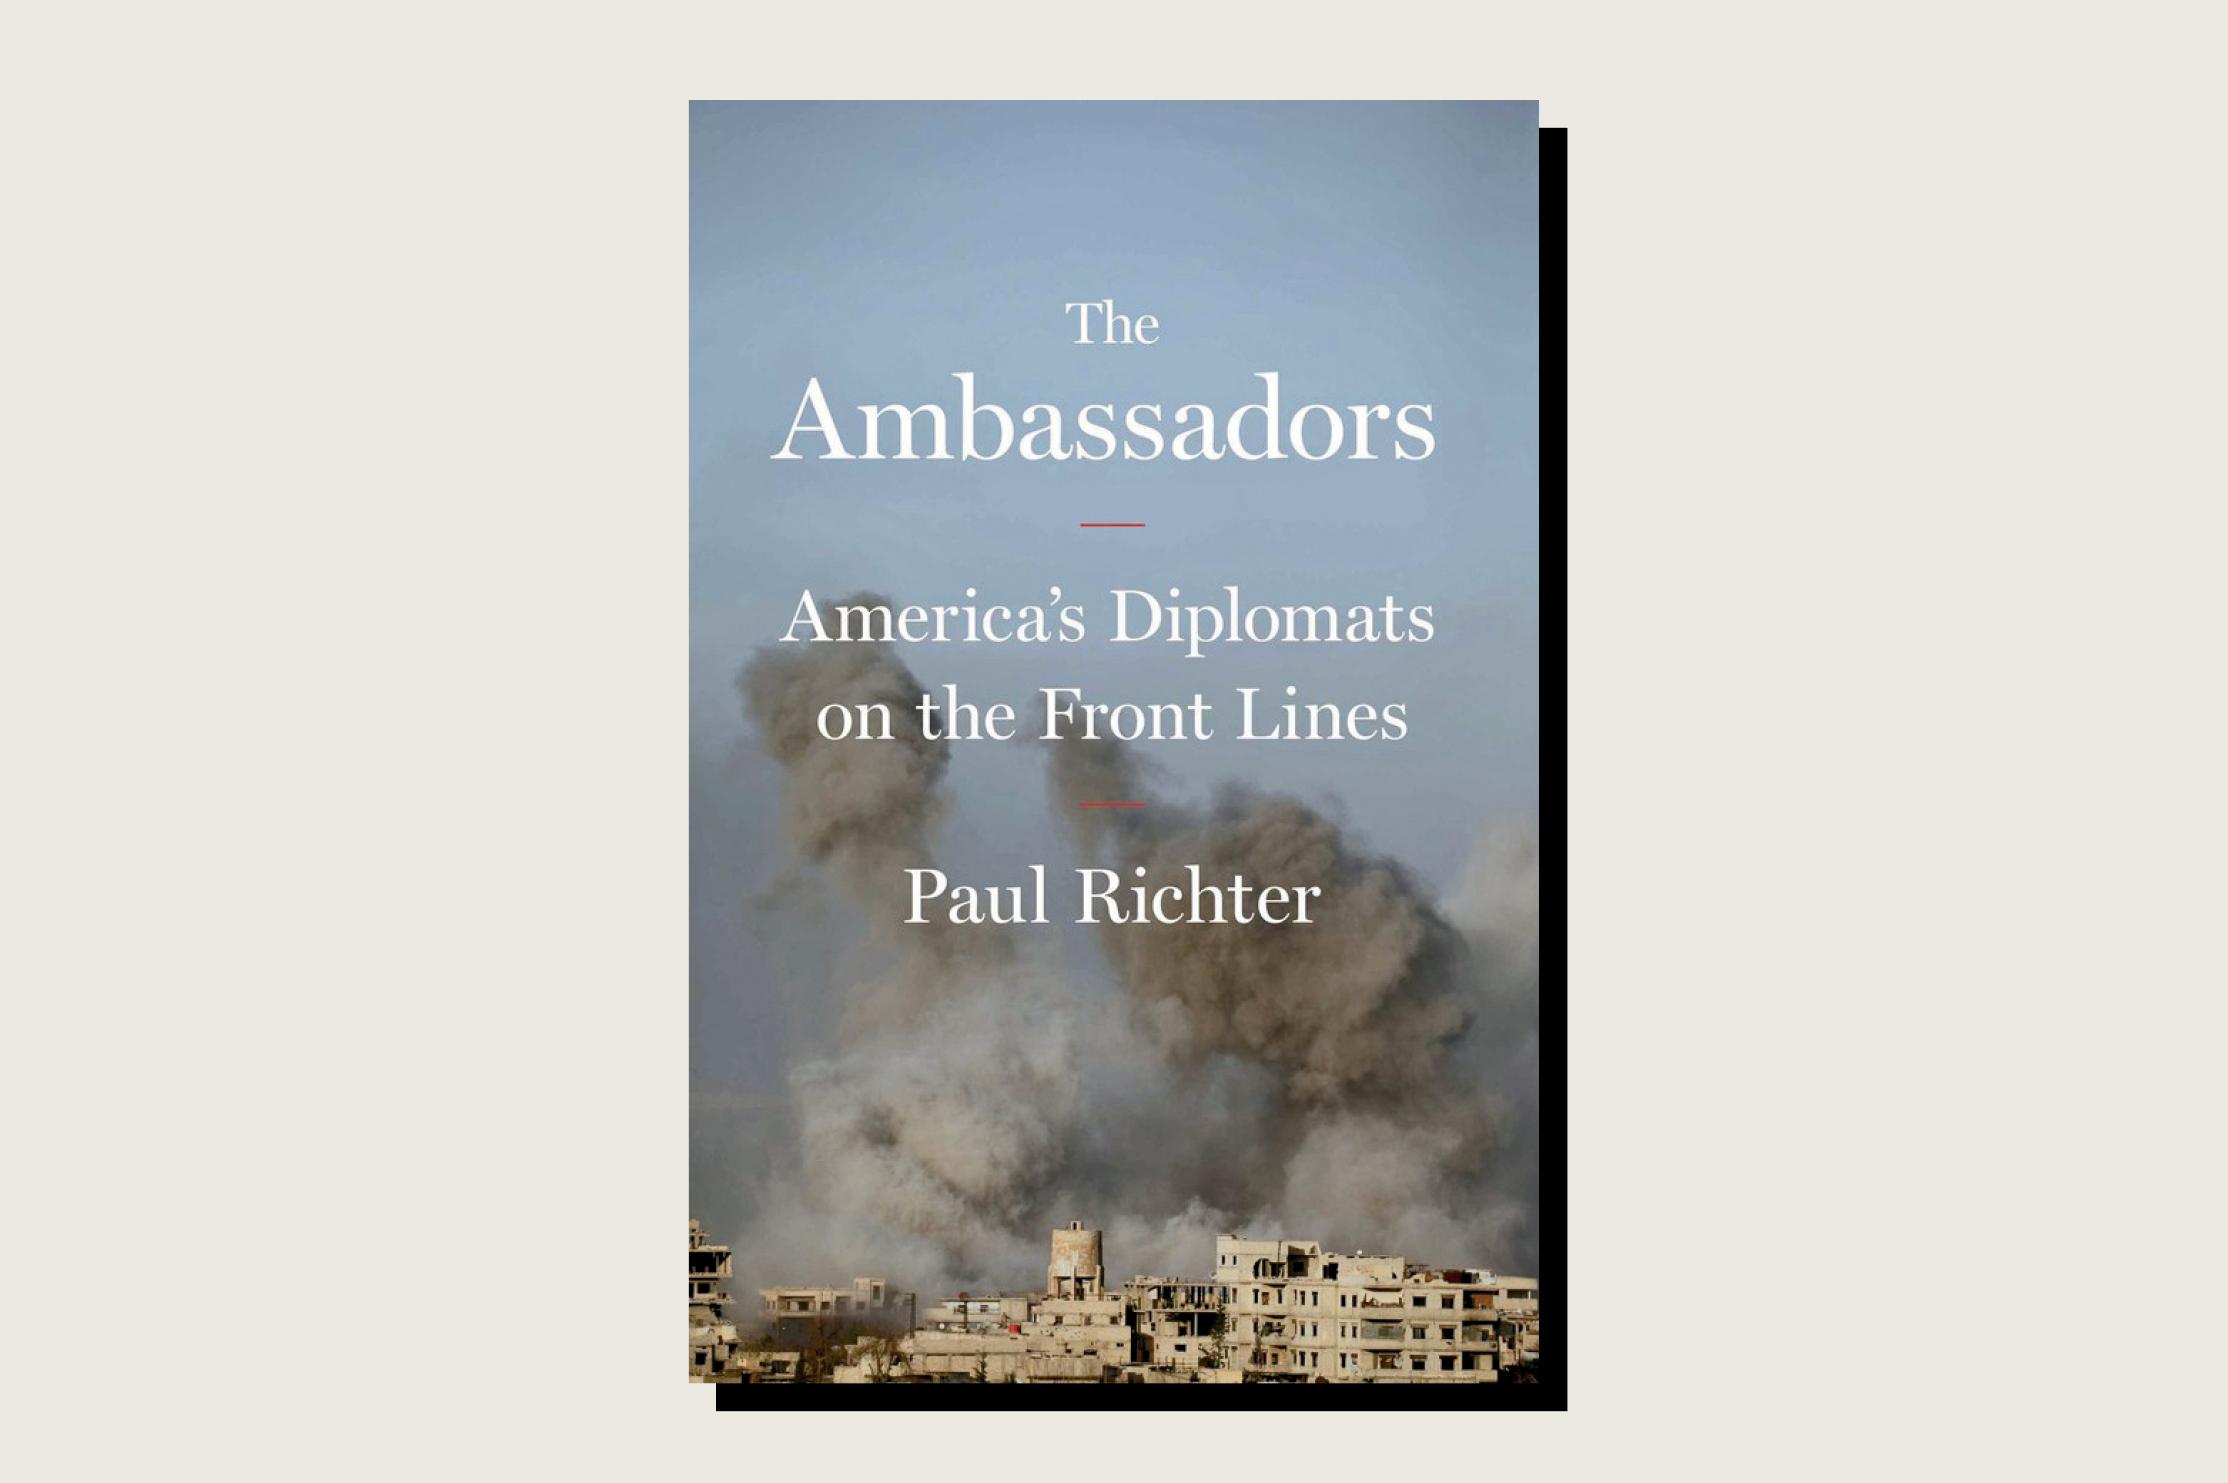 The Ambassadors: America's Diplomats on the Front Lines, Paul Richter, Simon & Schuster, 352 pp., , November 2019